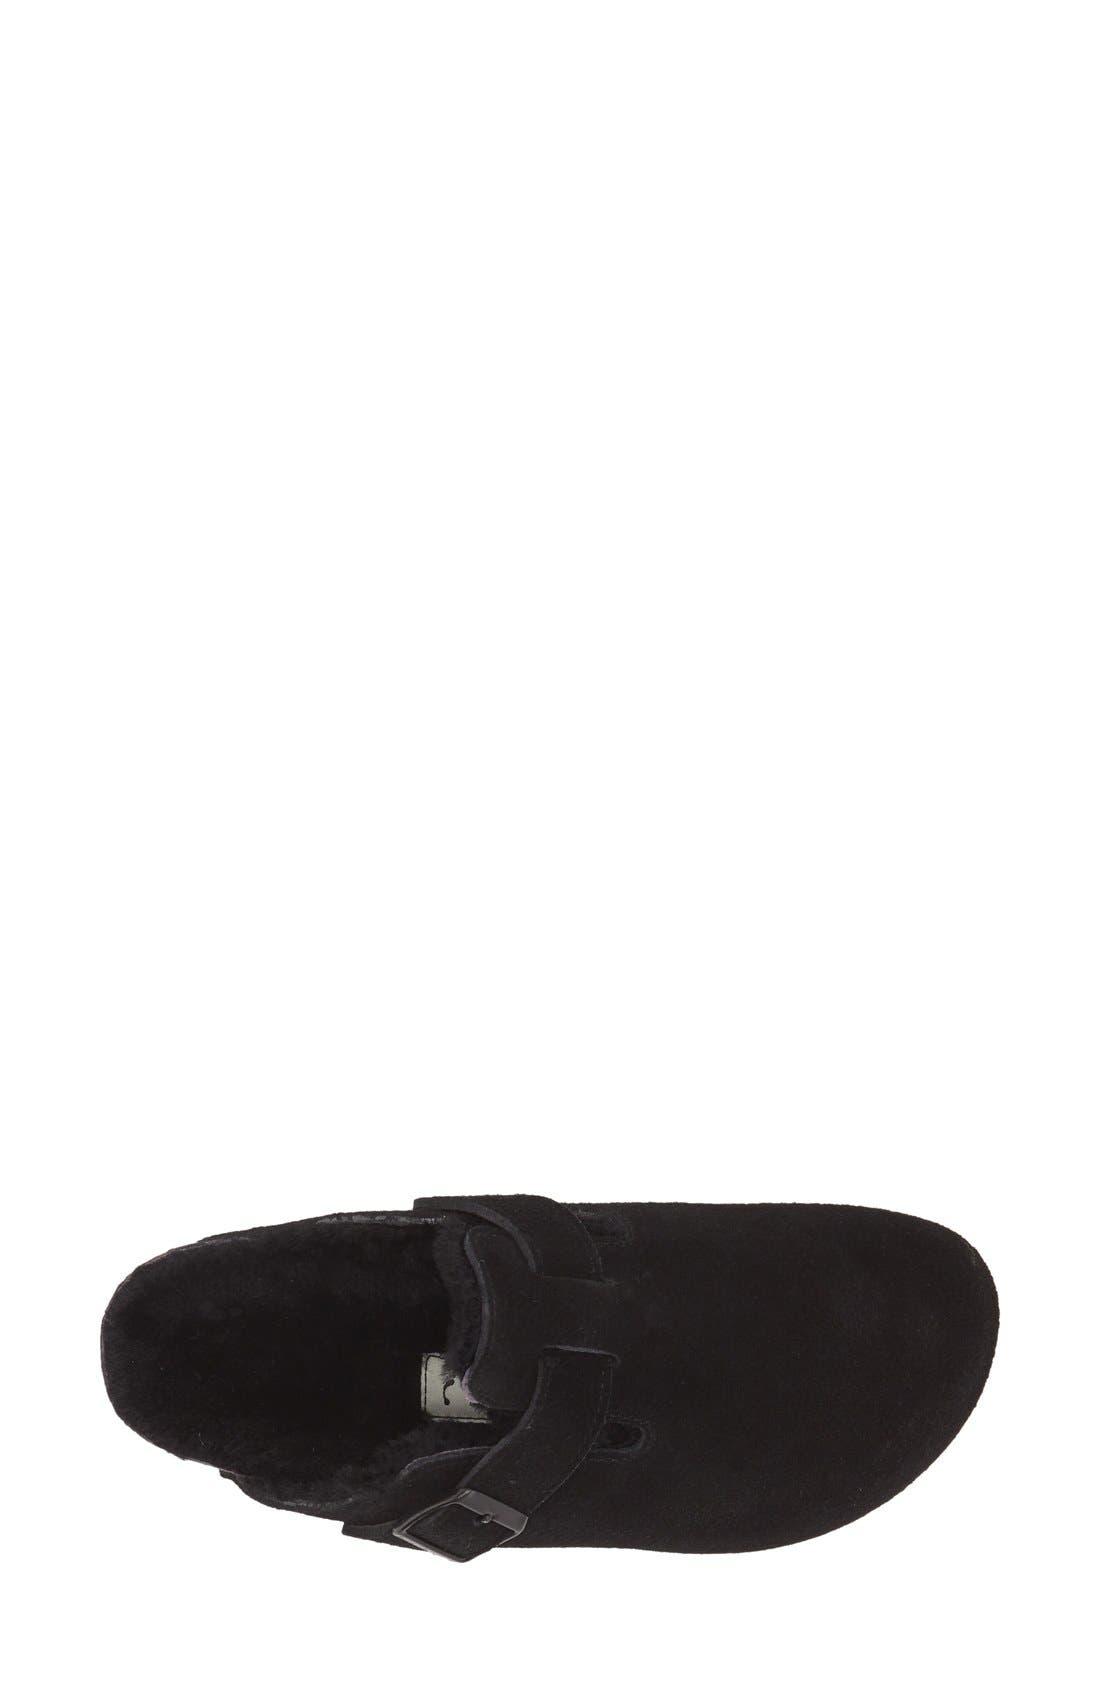 BIRKENSTOCK, 'Boston' Genuine Shearling Lined Clog, Alternate thumbnail 4, color, BLACK